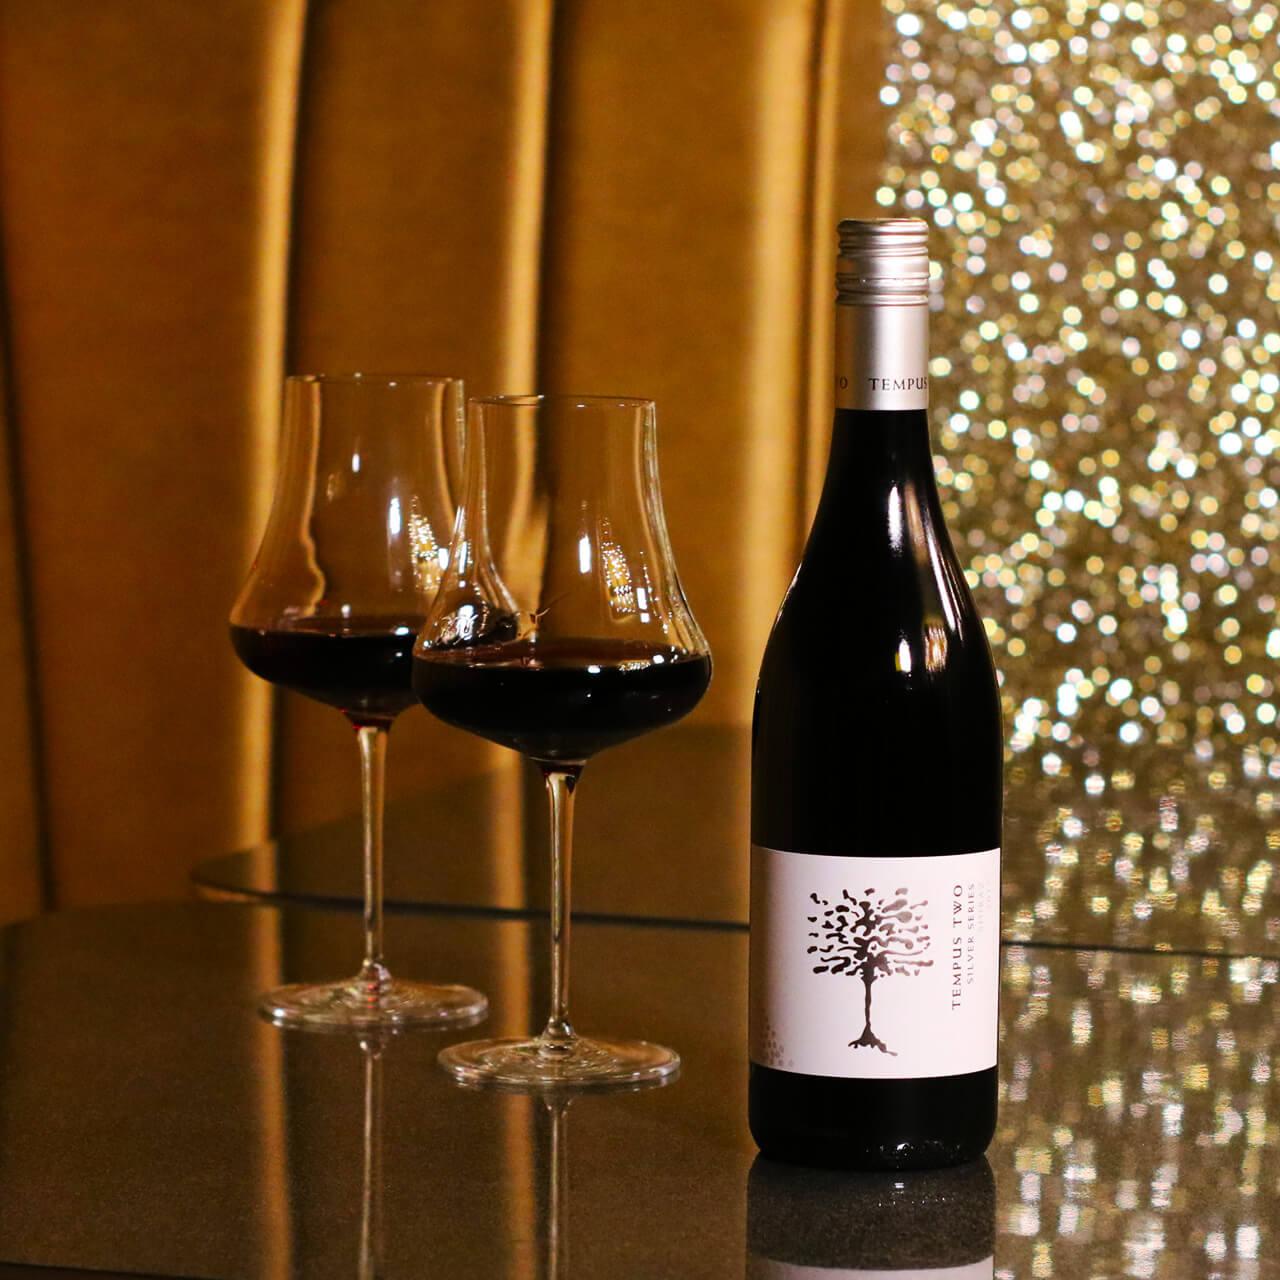 tempus_two_silver_series_shiraz_frankies_wine_bar_-02-12-2020-10-08-51.jpg